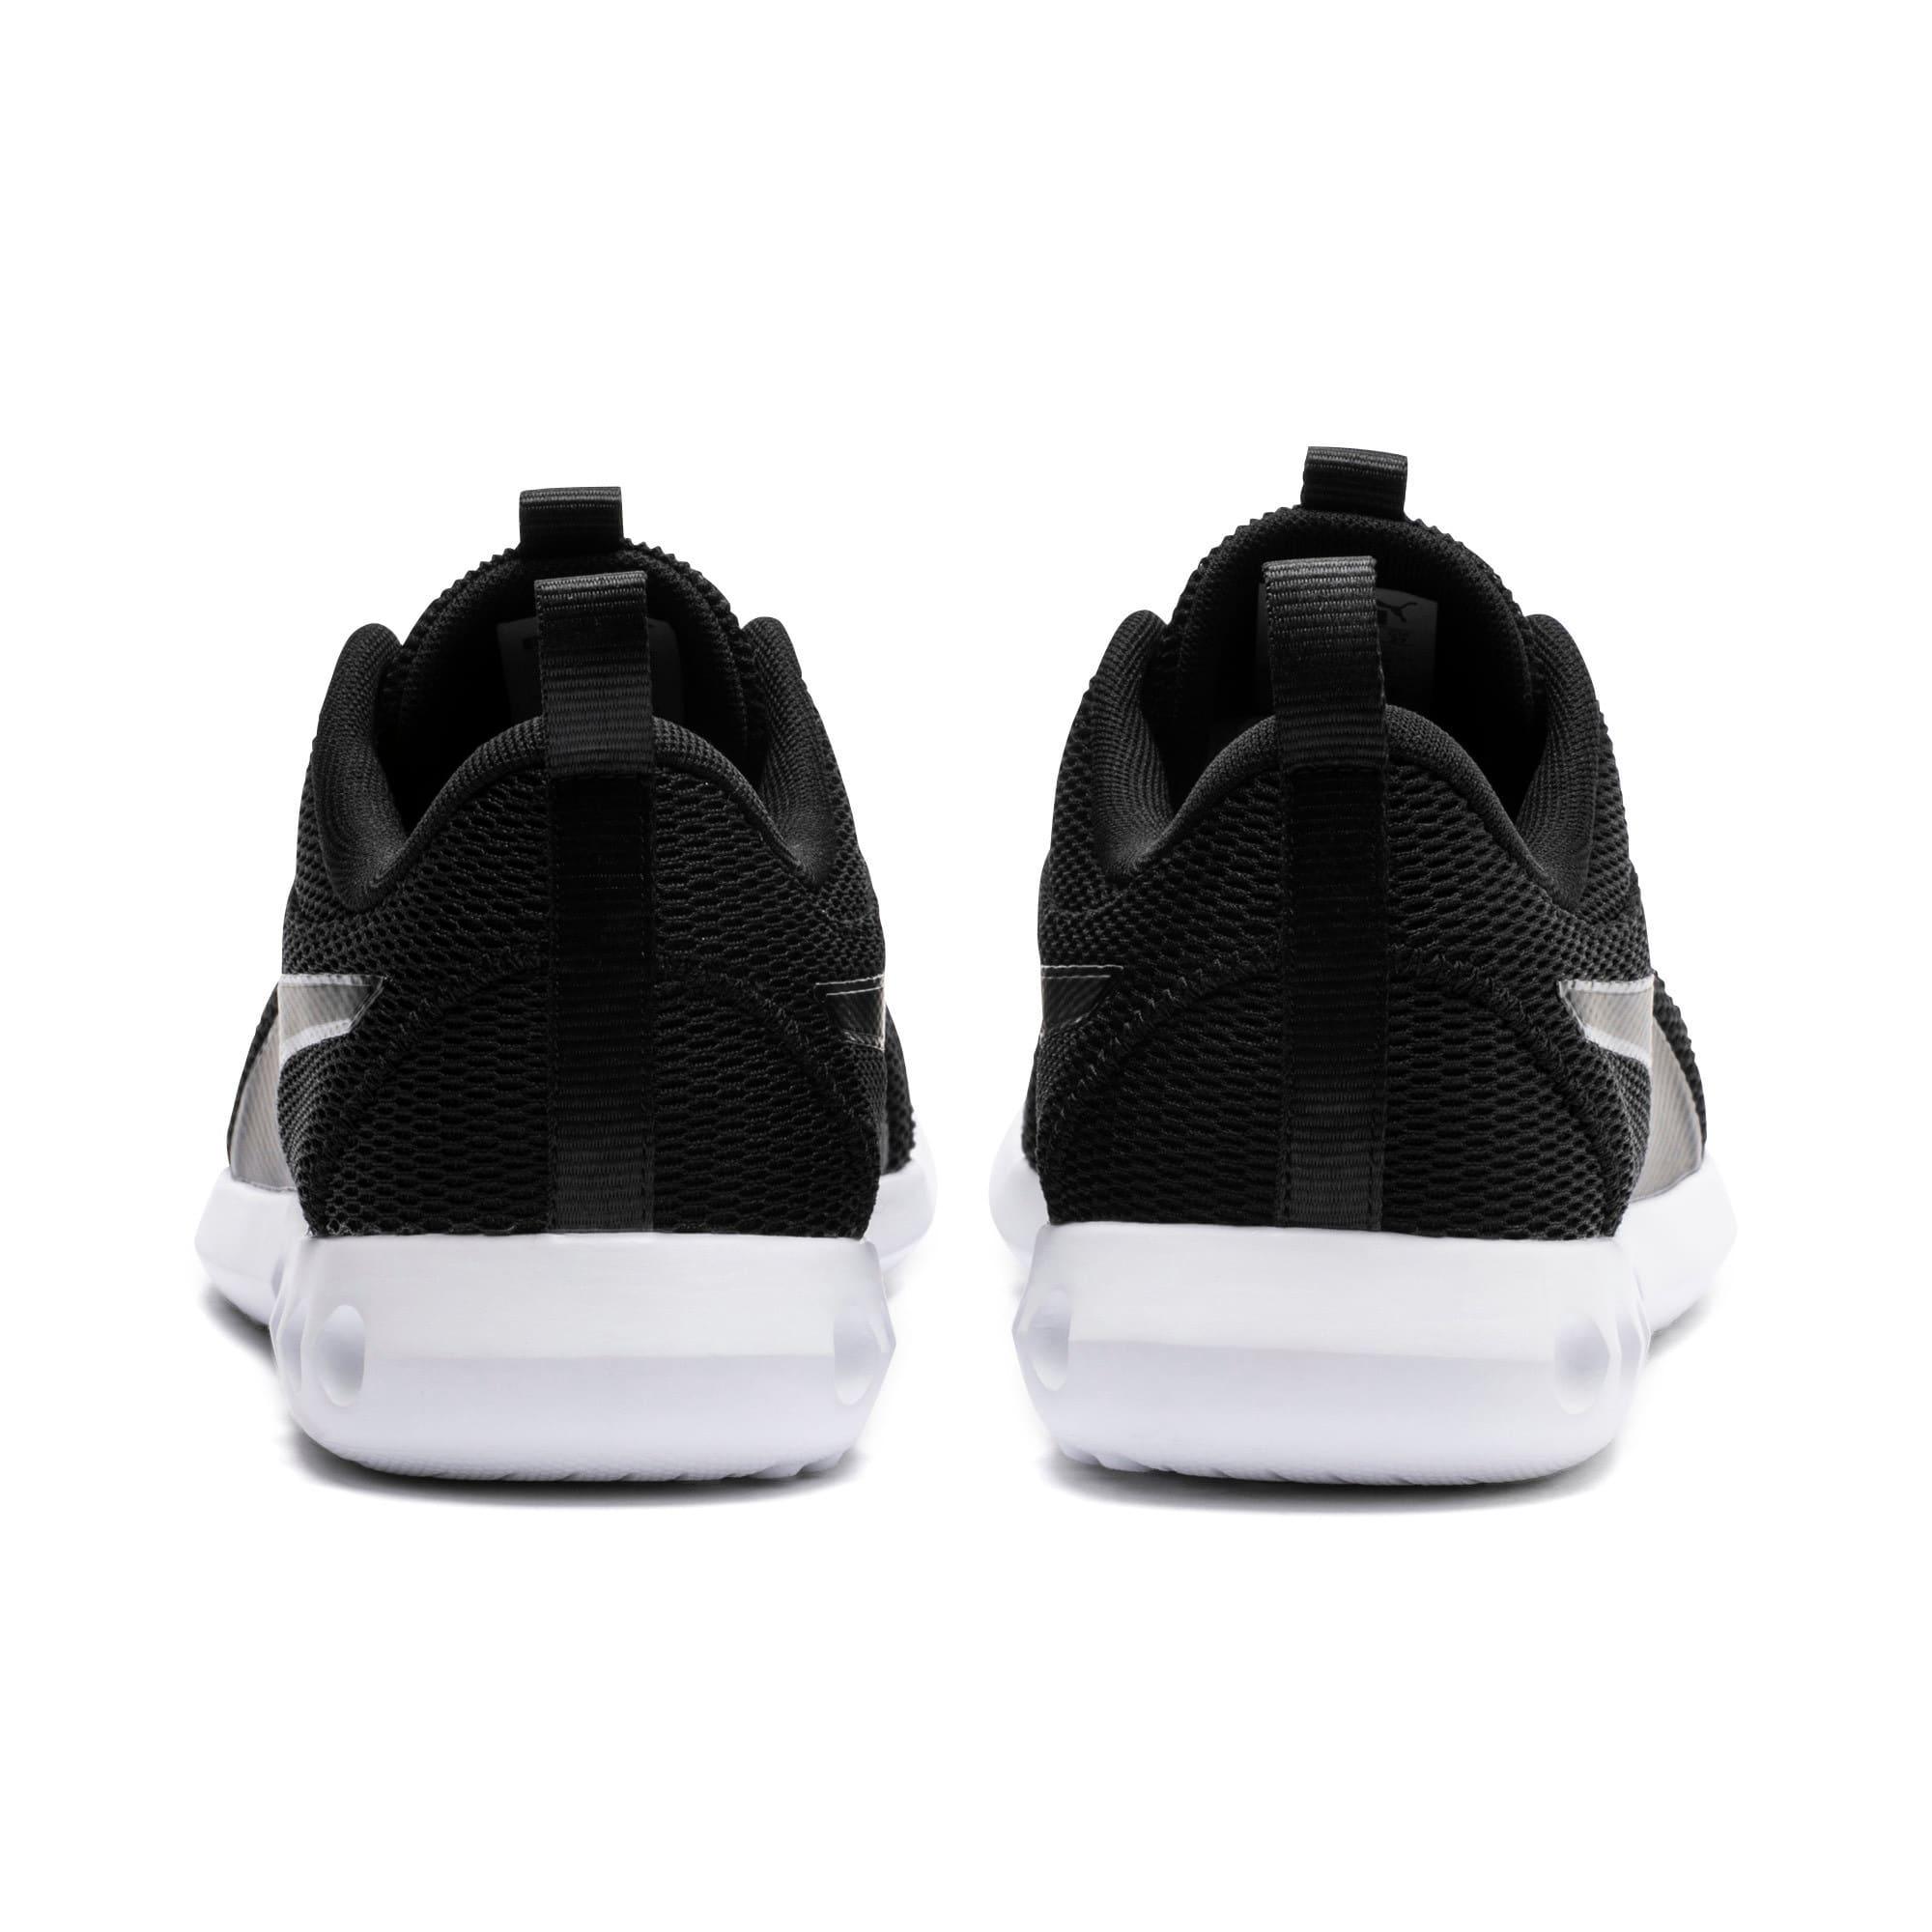 Miniatura 4 de Zapatos para correrCarson 2 New Corepara hombre, Puma Black-Puma White, mediano